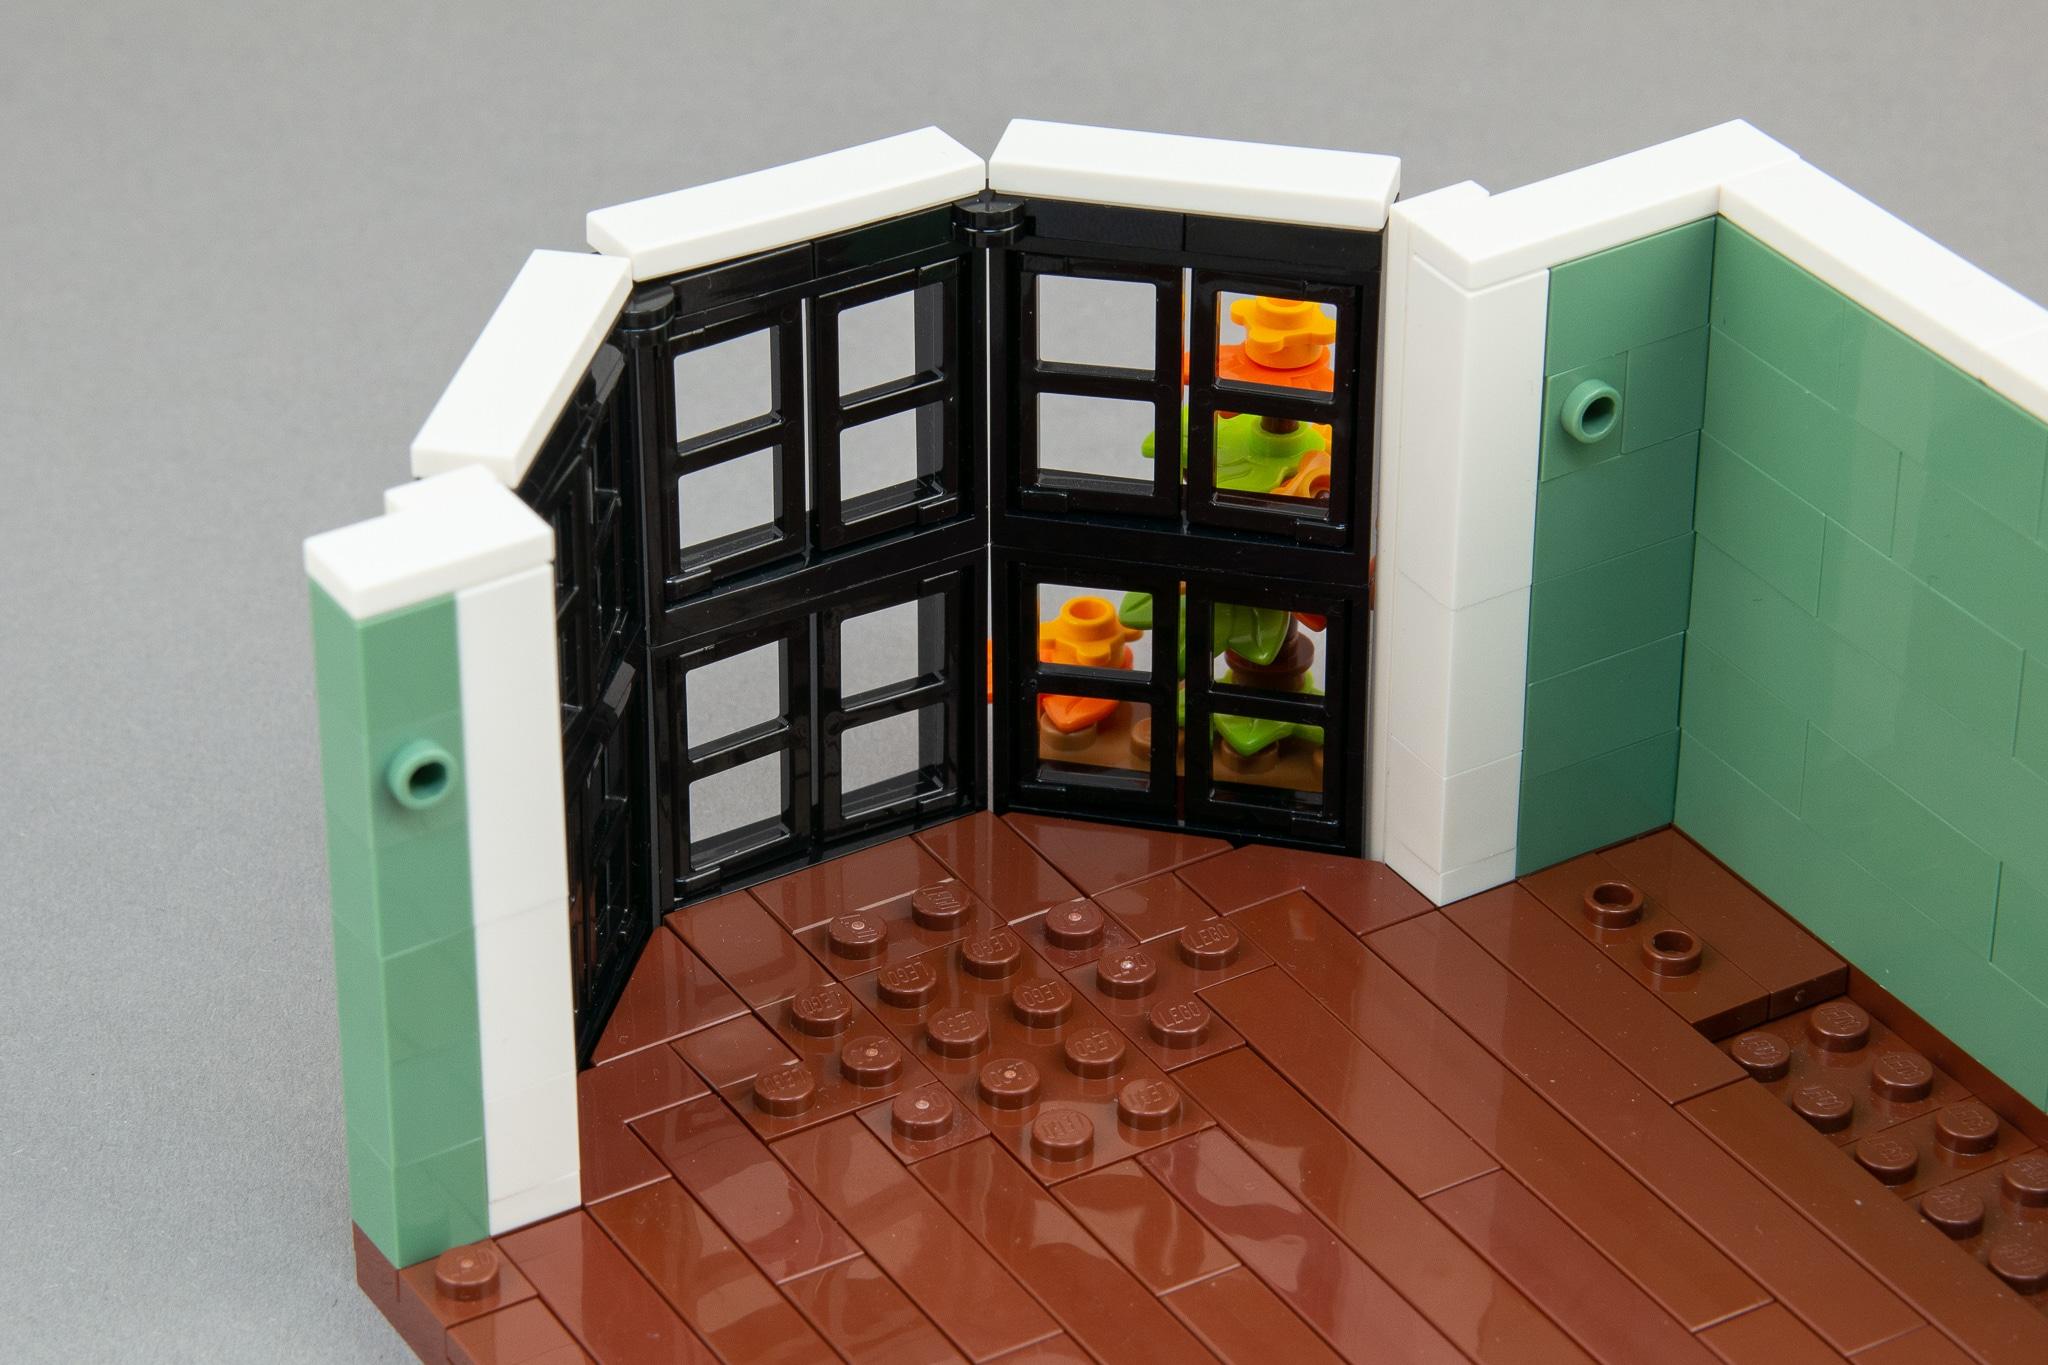 LEGO Moc Bausinpiration Esszimmer (17)